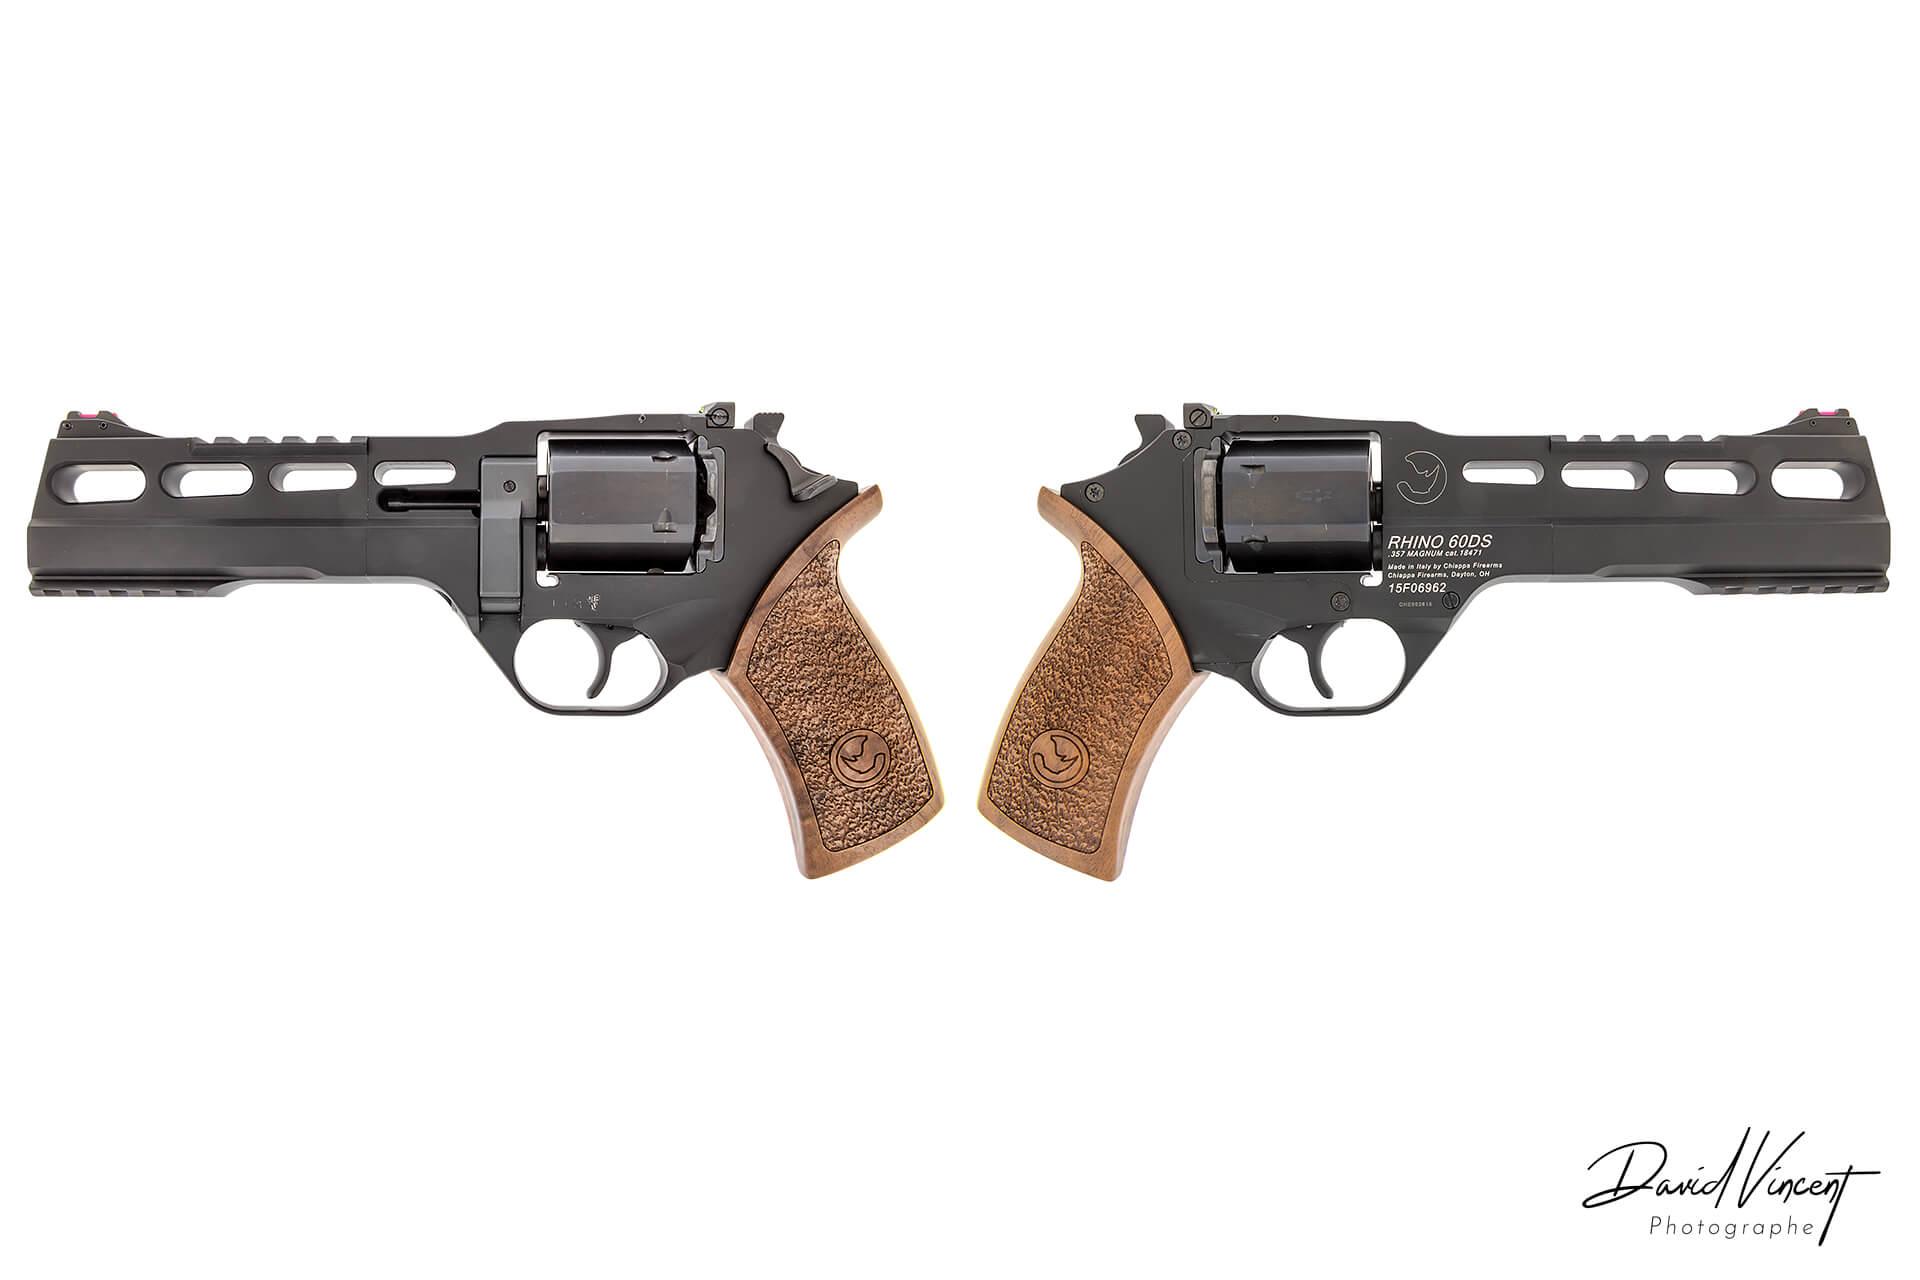 Chiappa Rhino 60DS - Photographe d'armes à feu